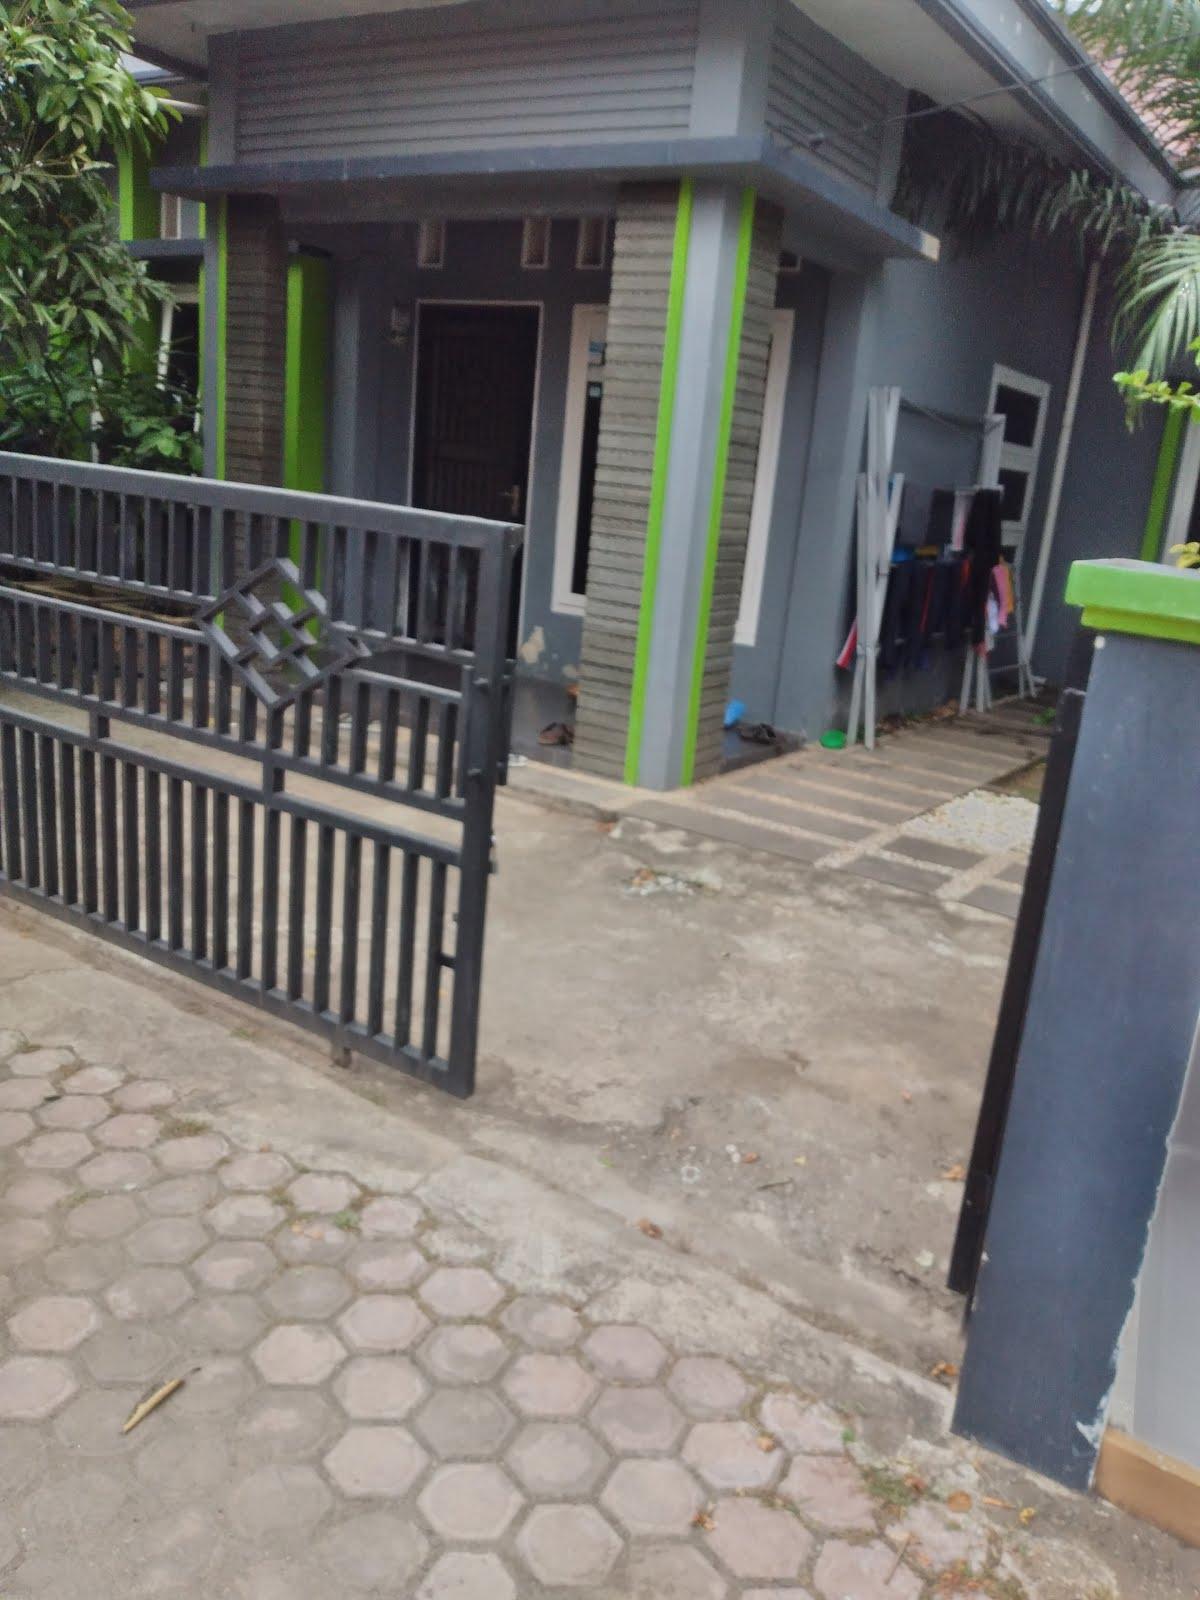 Rumah plus perabotan lengkap dijual Rp.650 juta. Tiga kamar tidur